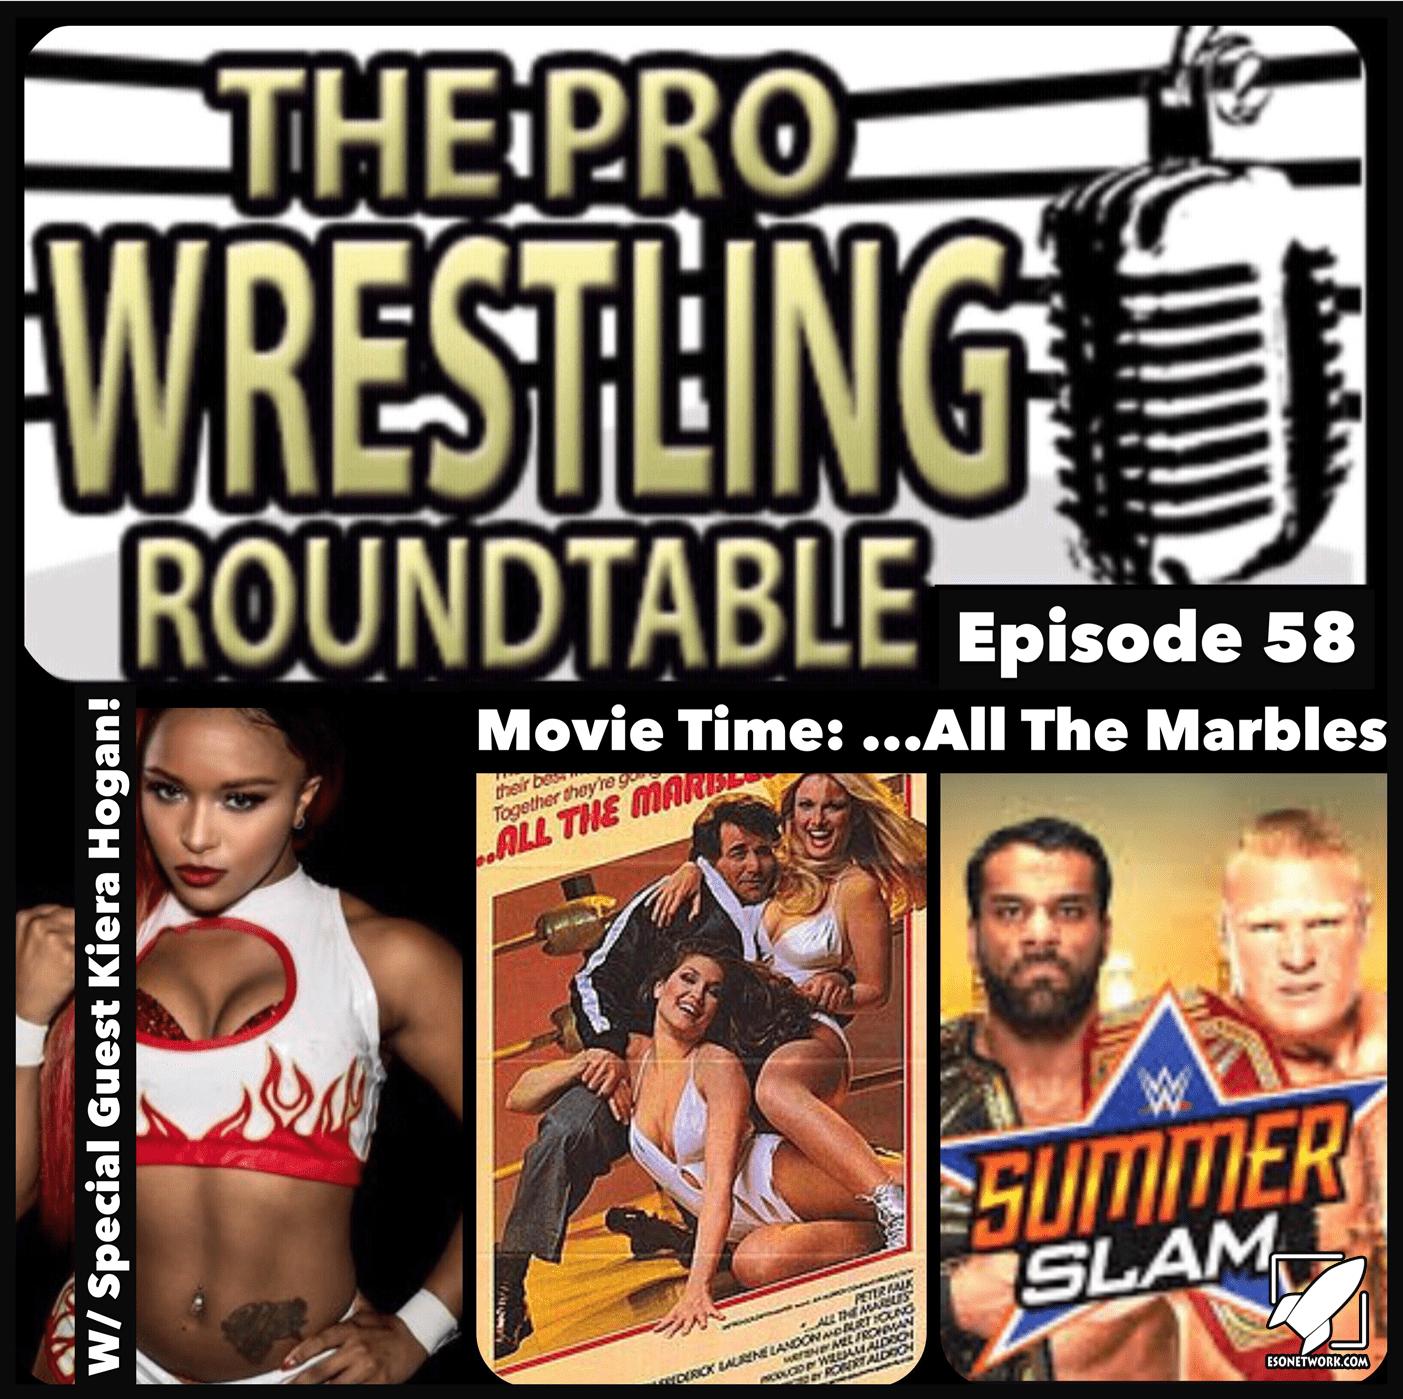 Pro Wrestling Roundtable Ep 58